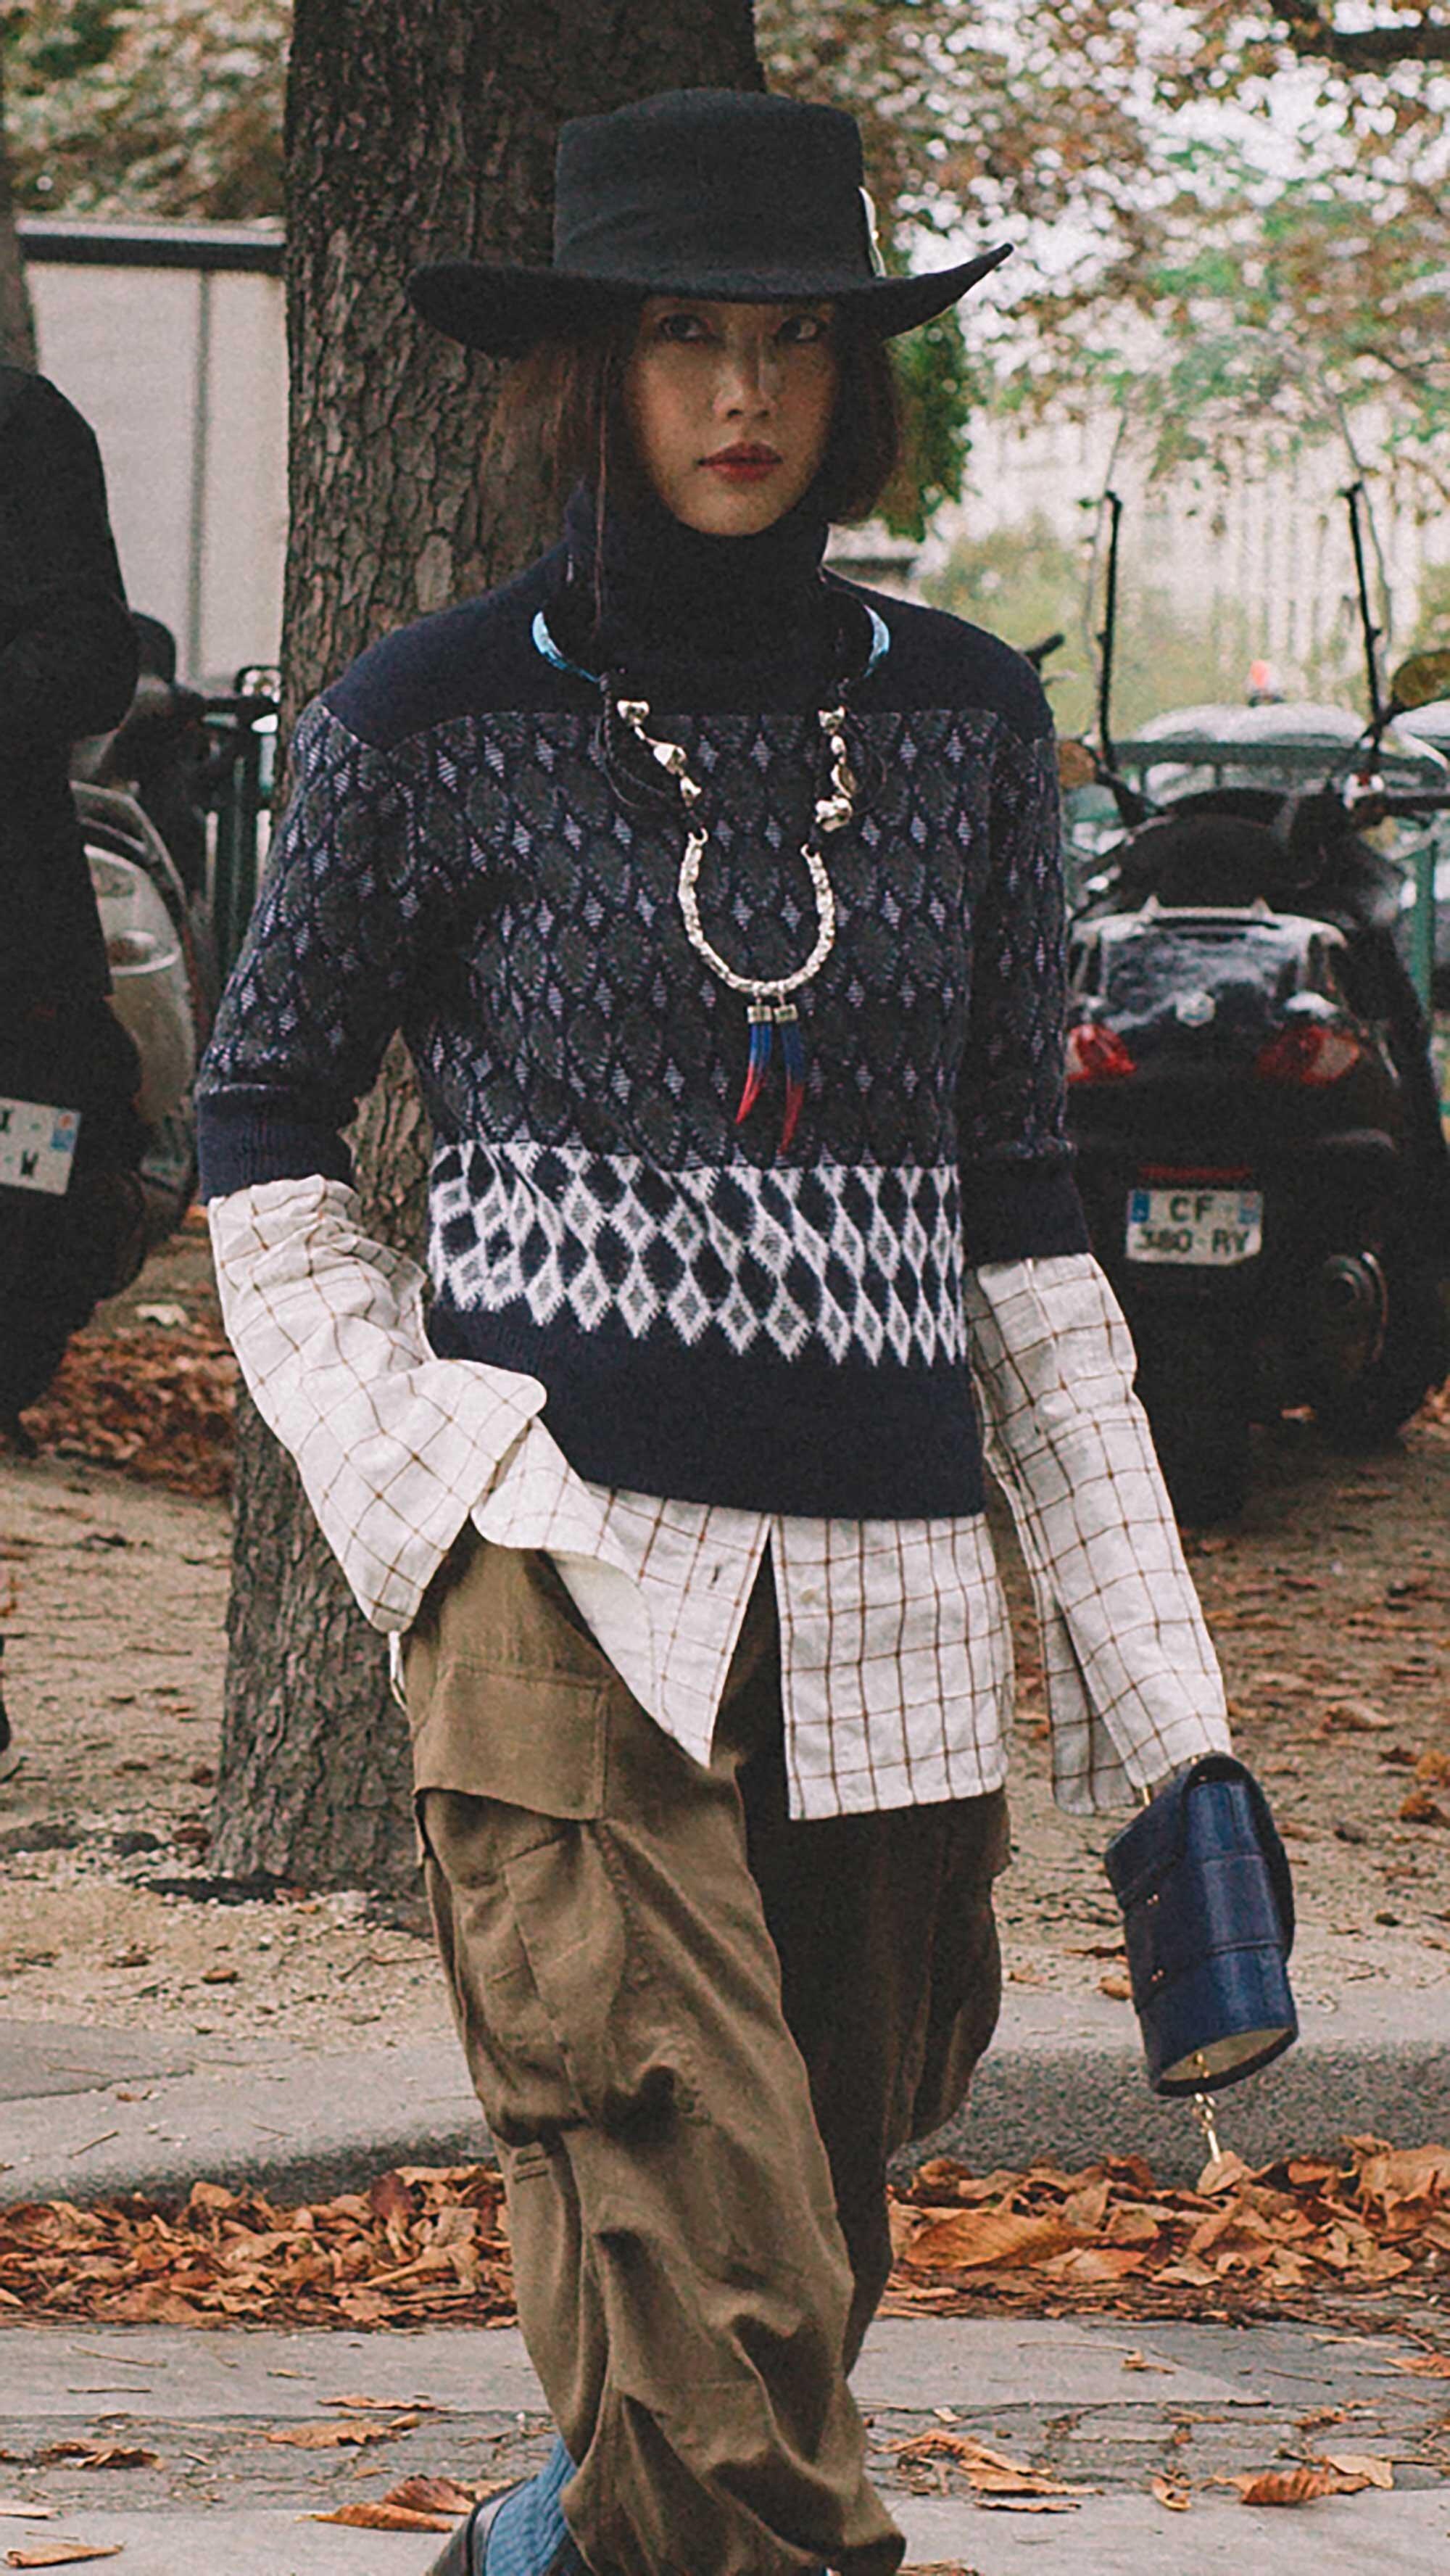 13. Chloe - Intarsia merino wool-blend turtleneck sweater